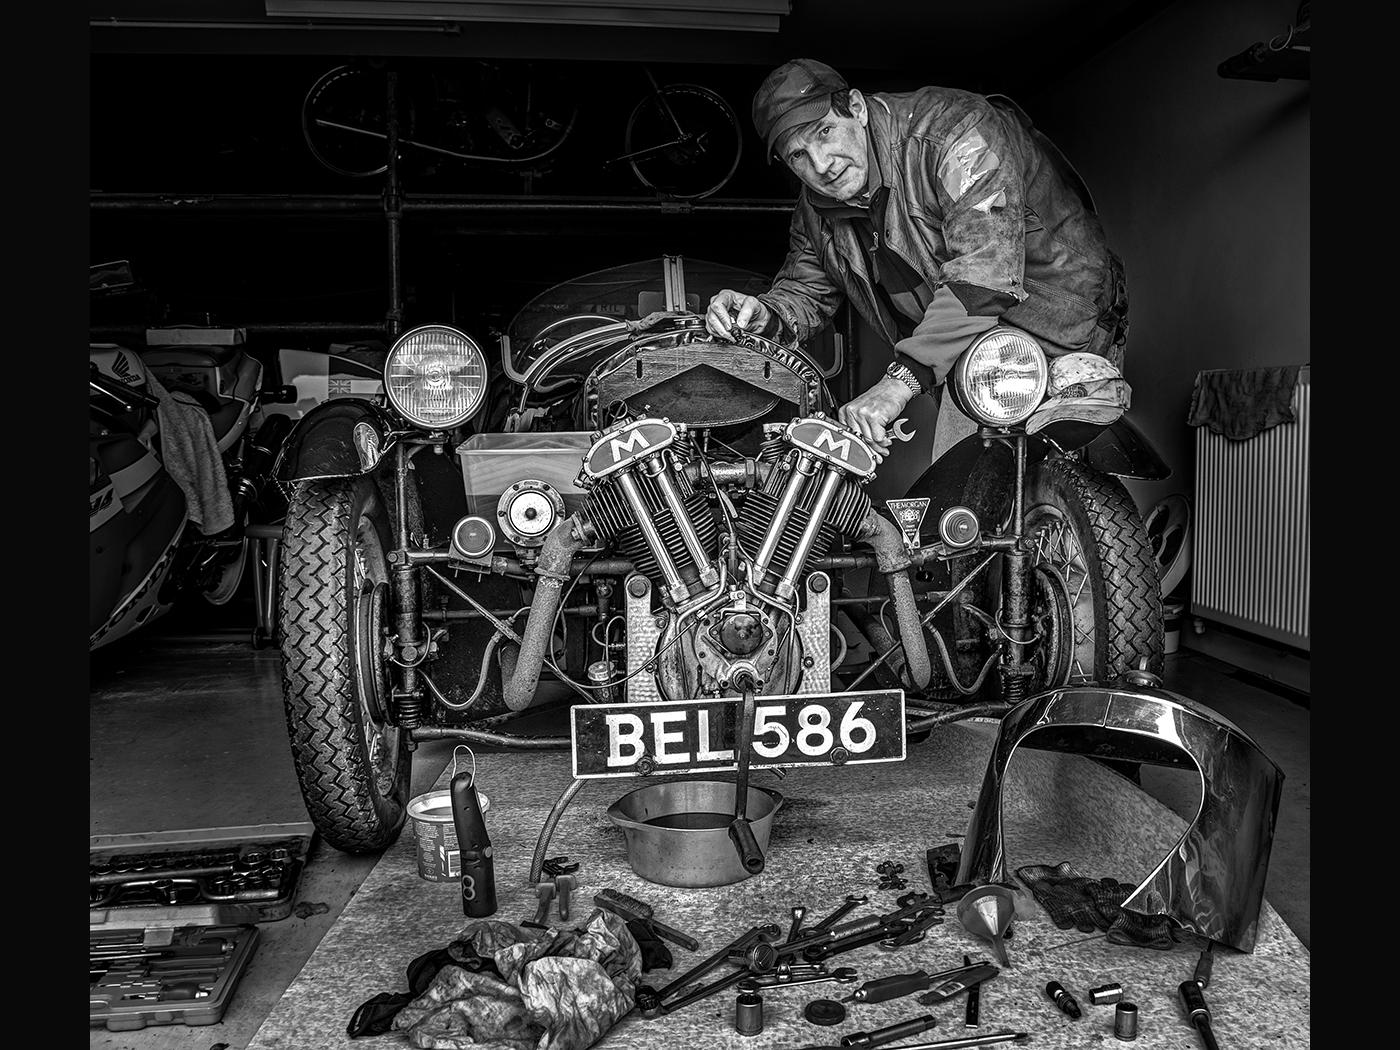 Morgan 3 Wheeler - Repairs